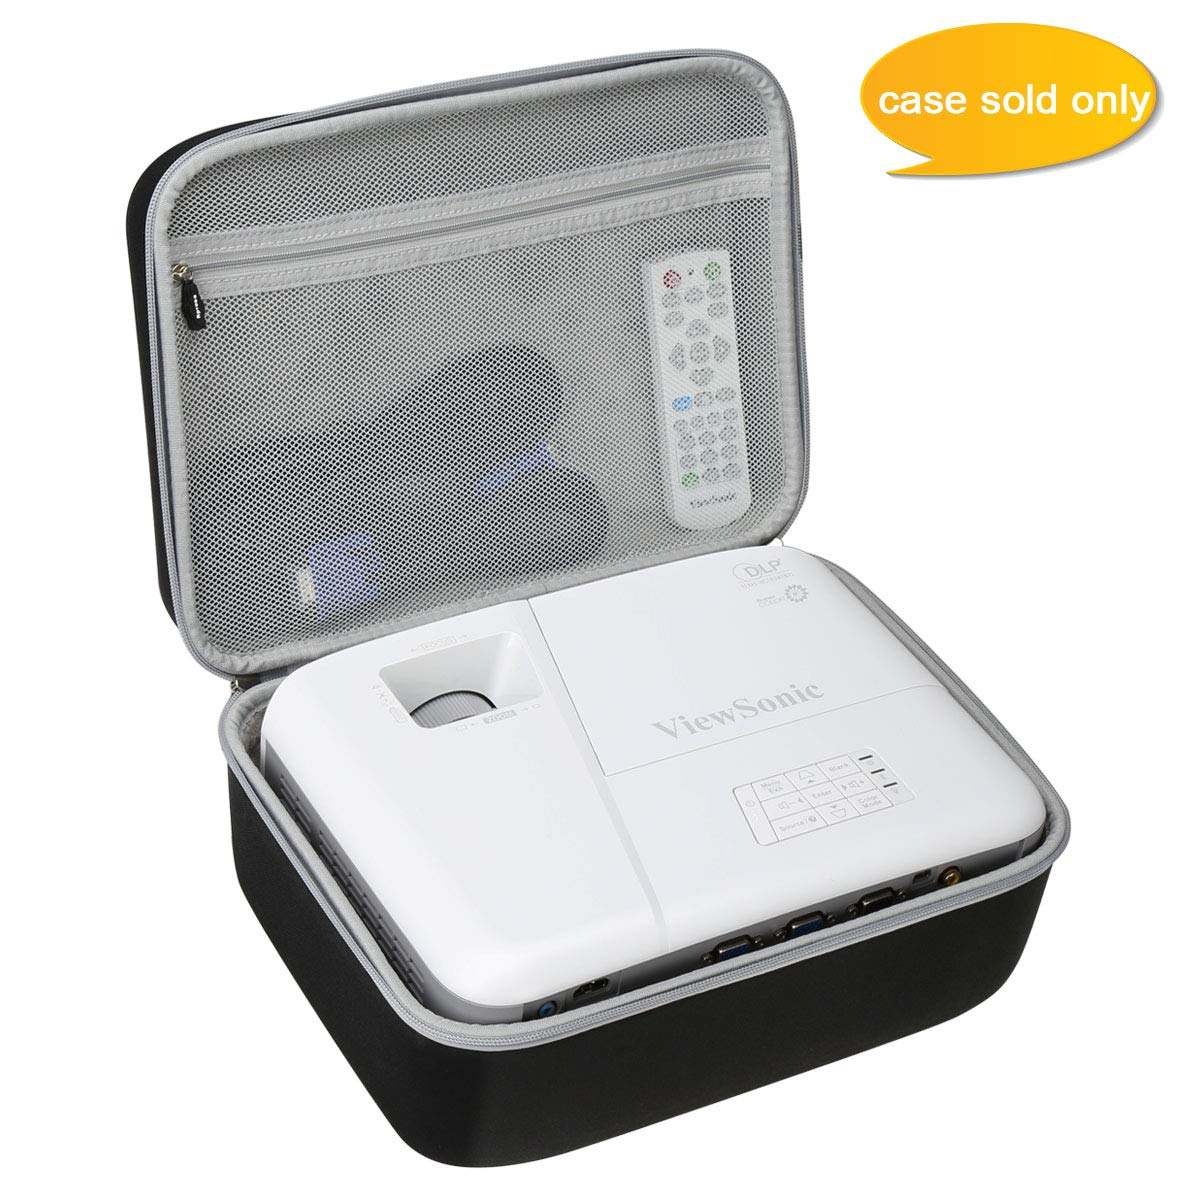 Aproca Hard Carry Travel Case fit ViewSonic 3600 Lumens SVGA High Brightness Projector (PA503S)